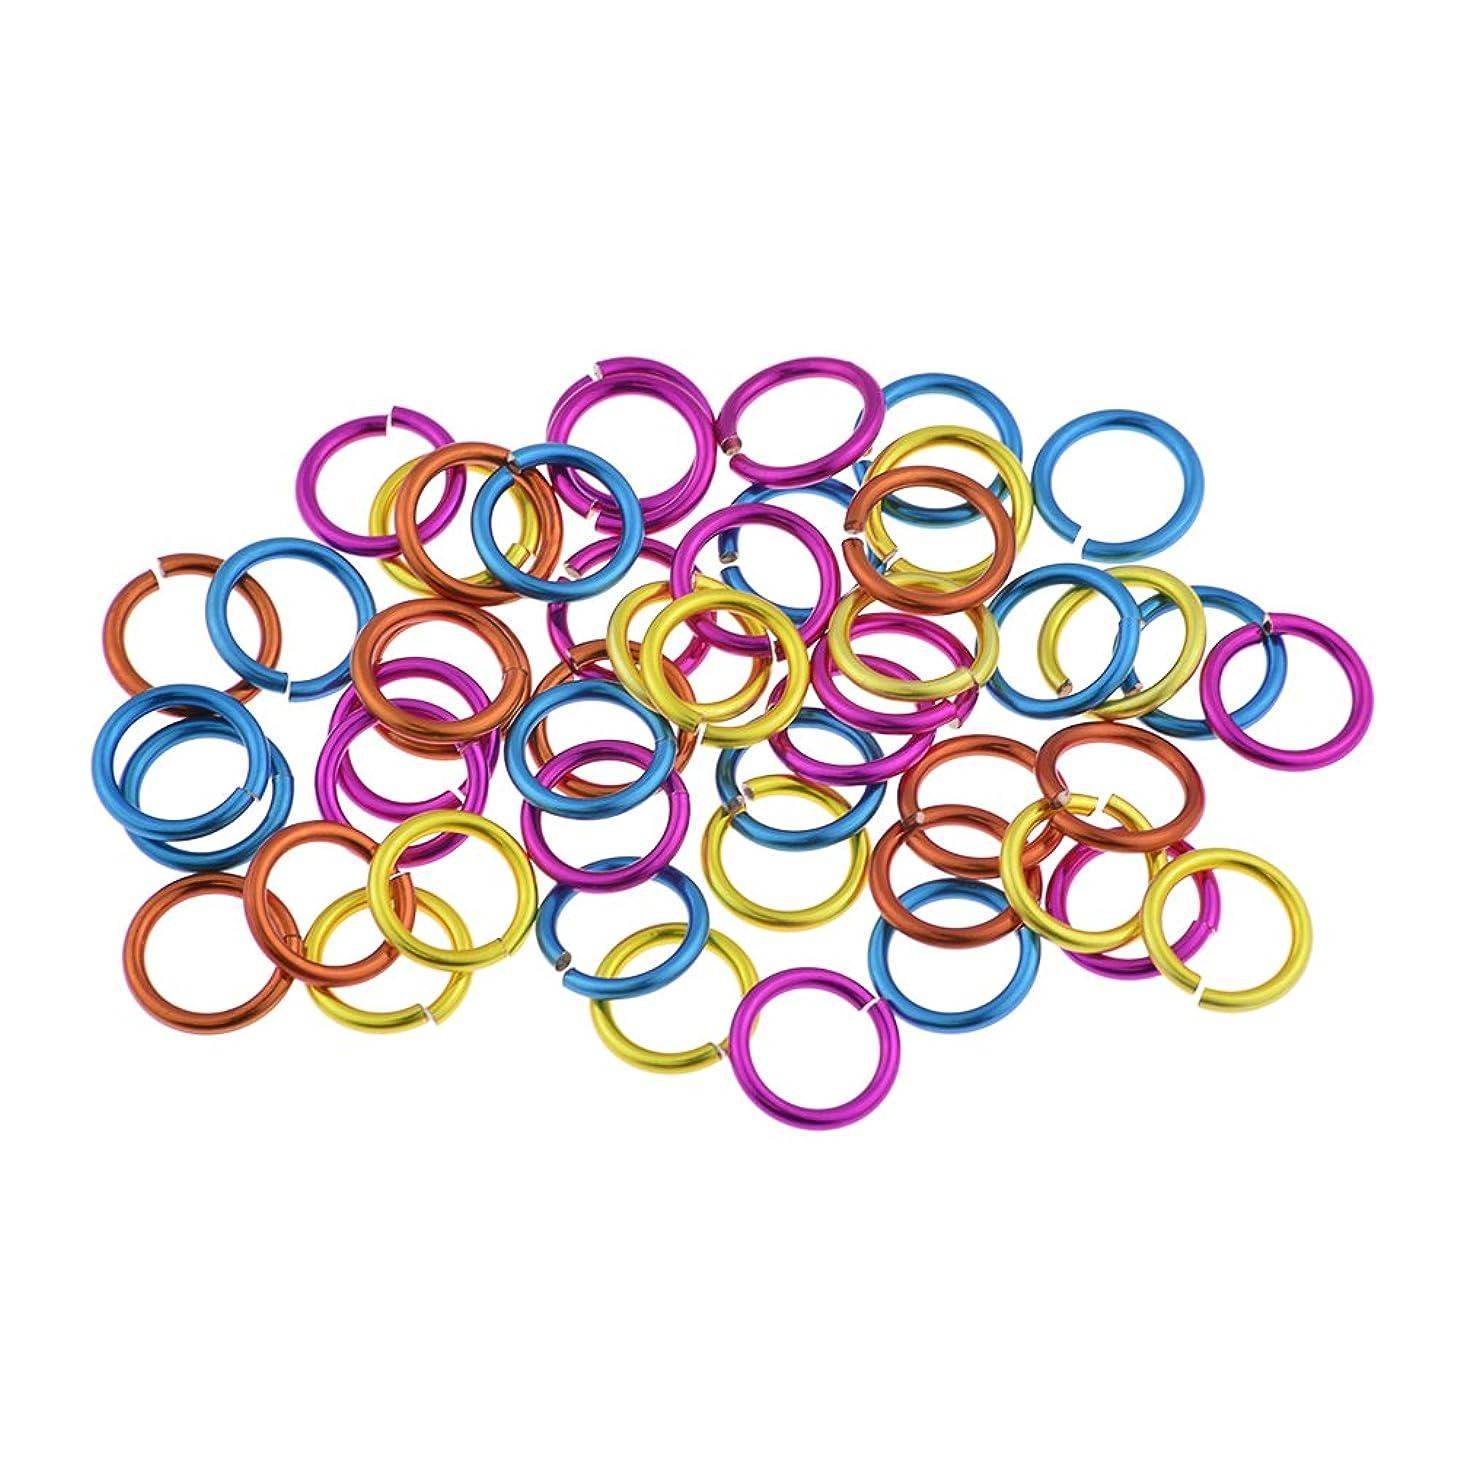 Weave Got Maille 18-Gauge 3.5mm Summer Slush Enameled Copper Jump Ring Mix - 1 Ounce